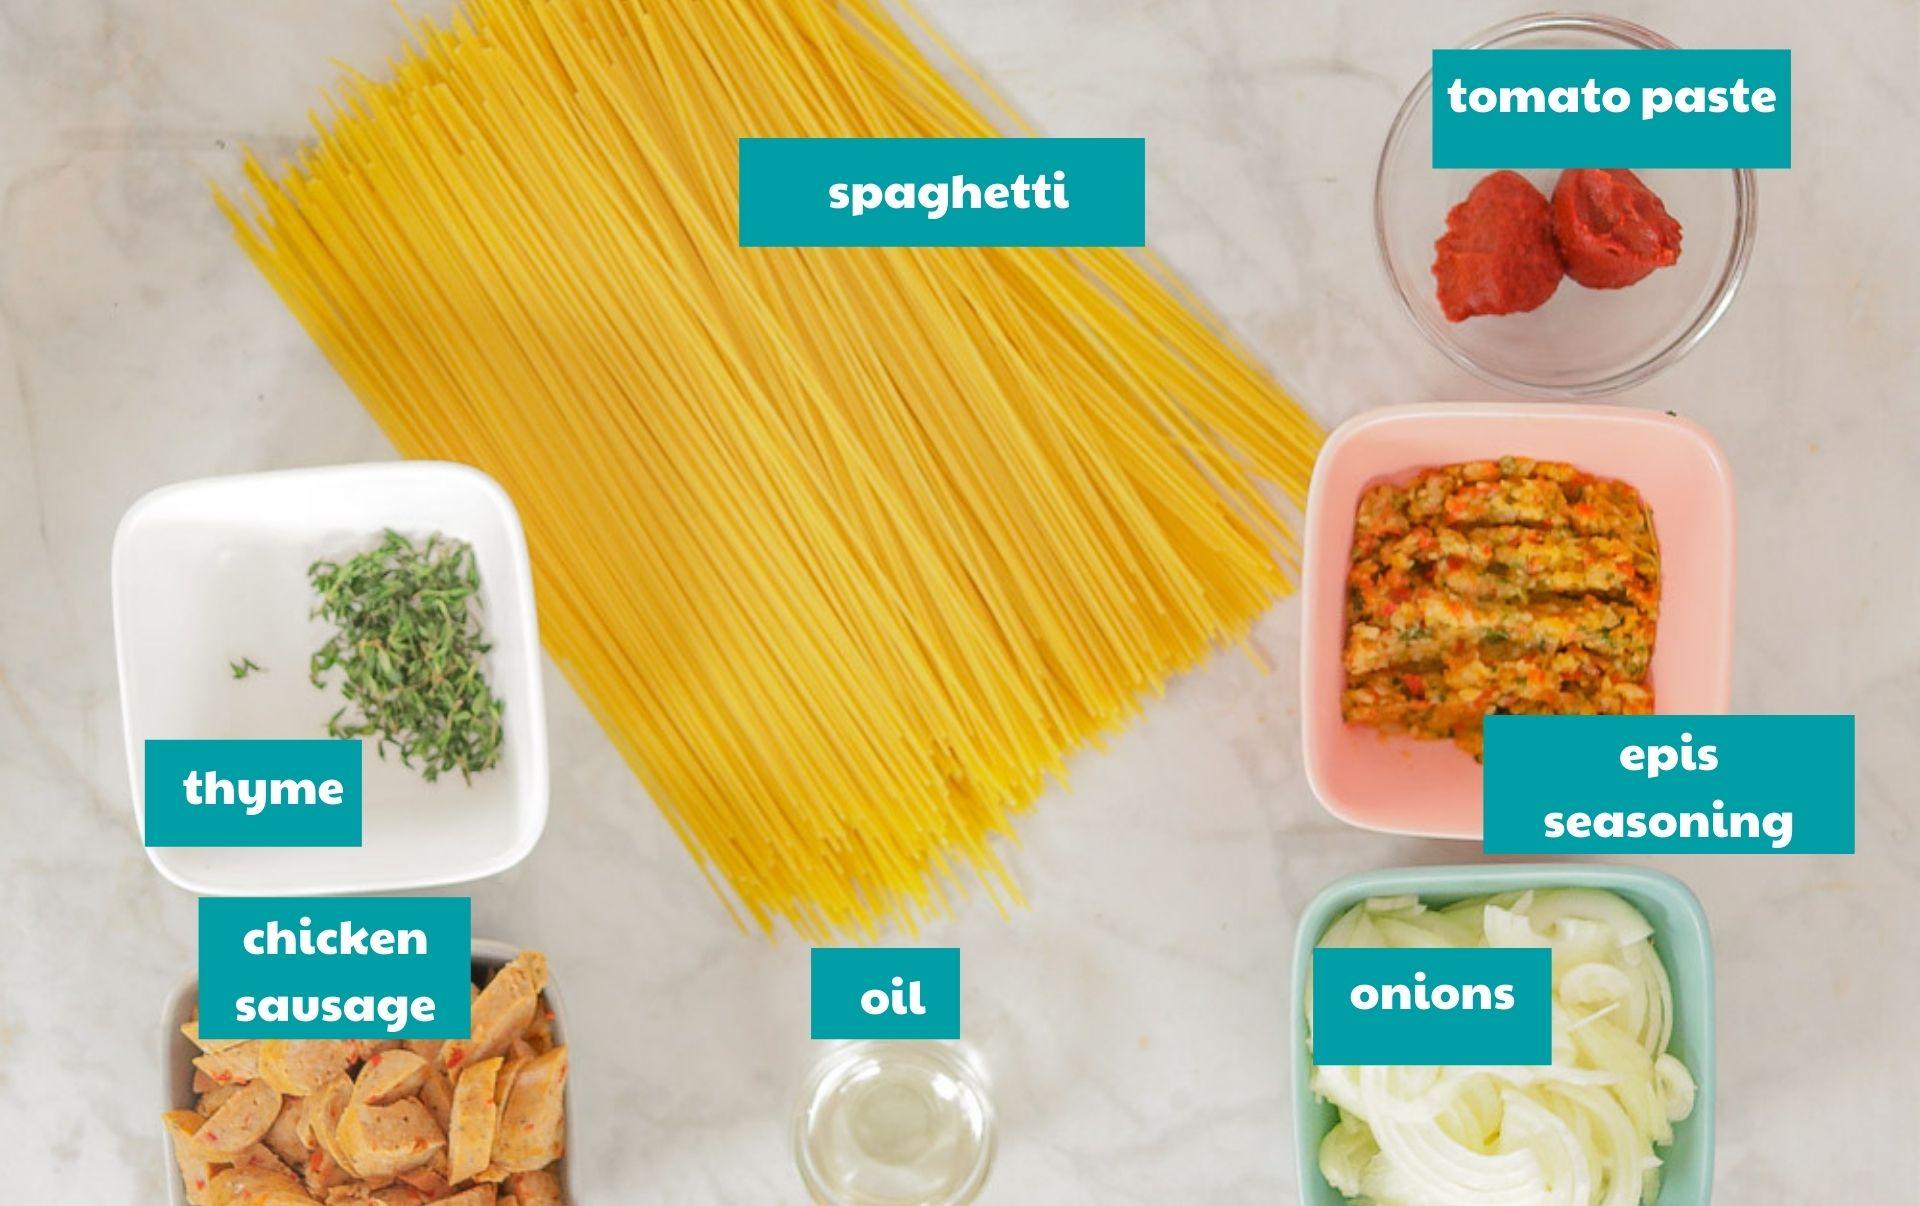 Haitian spaghetti ingredients